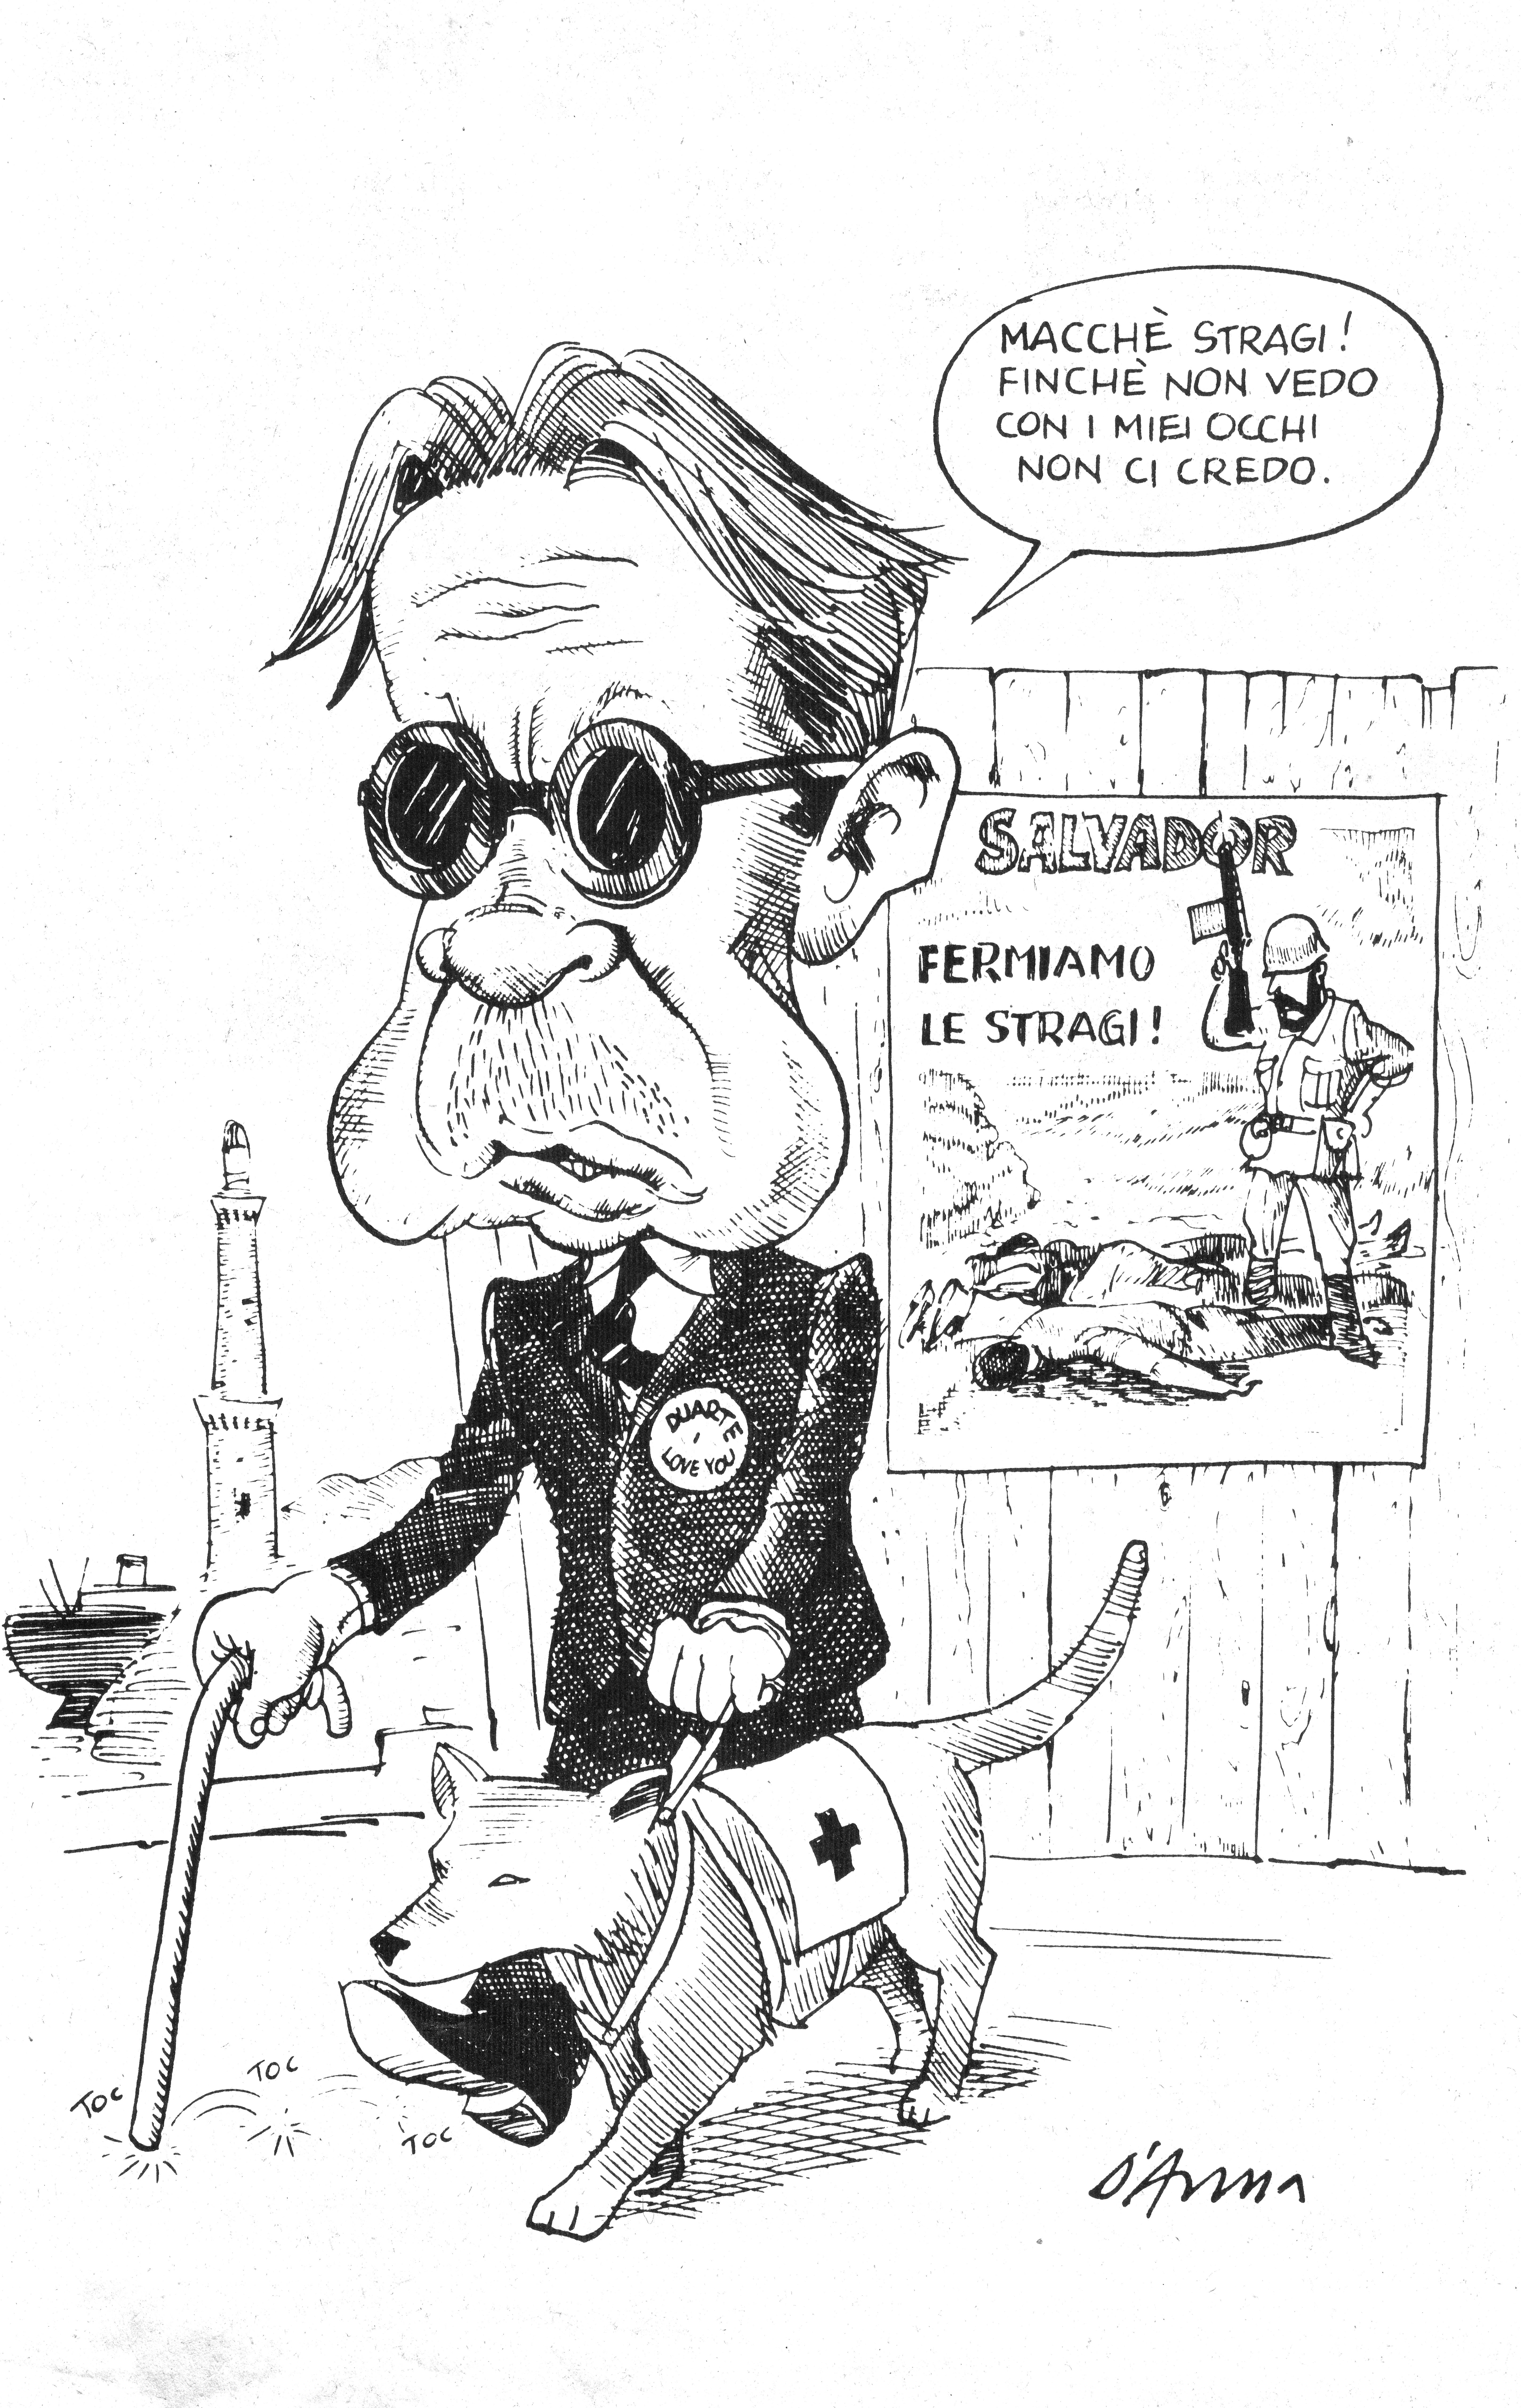 10-2-1982